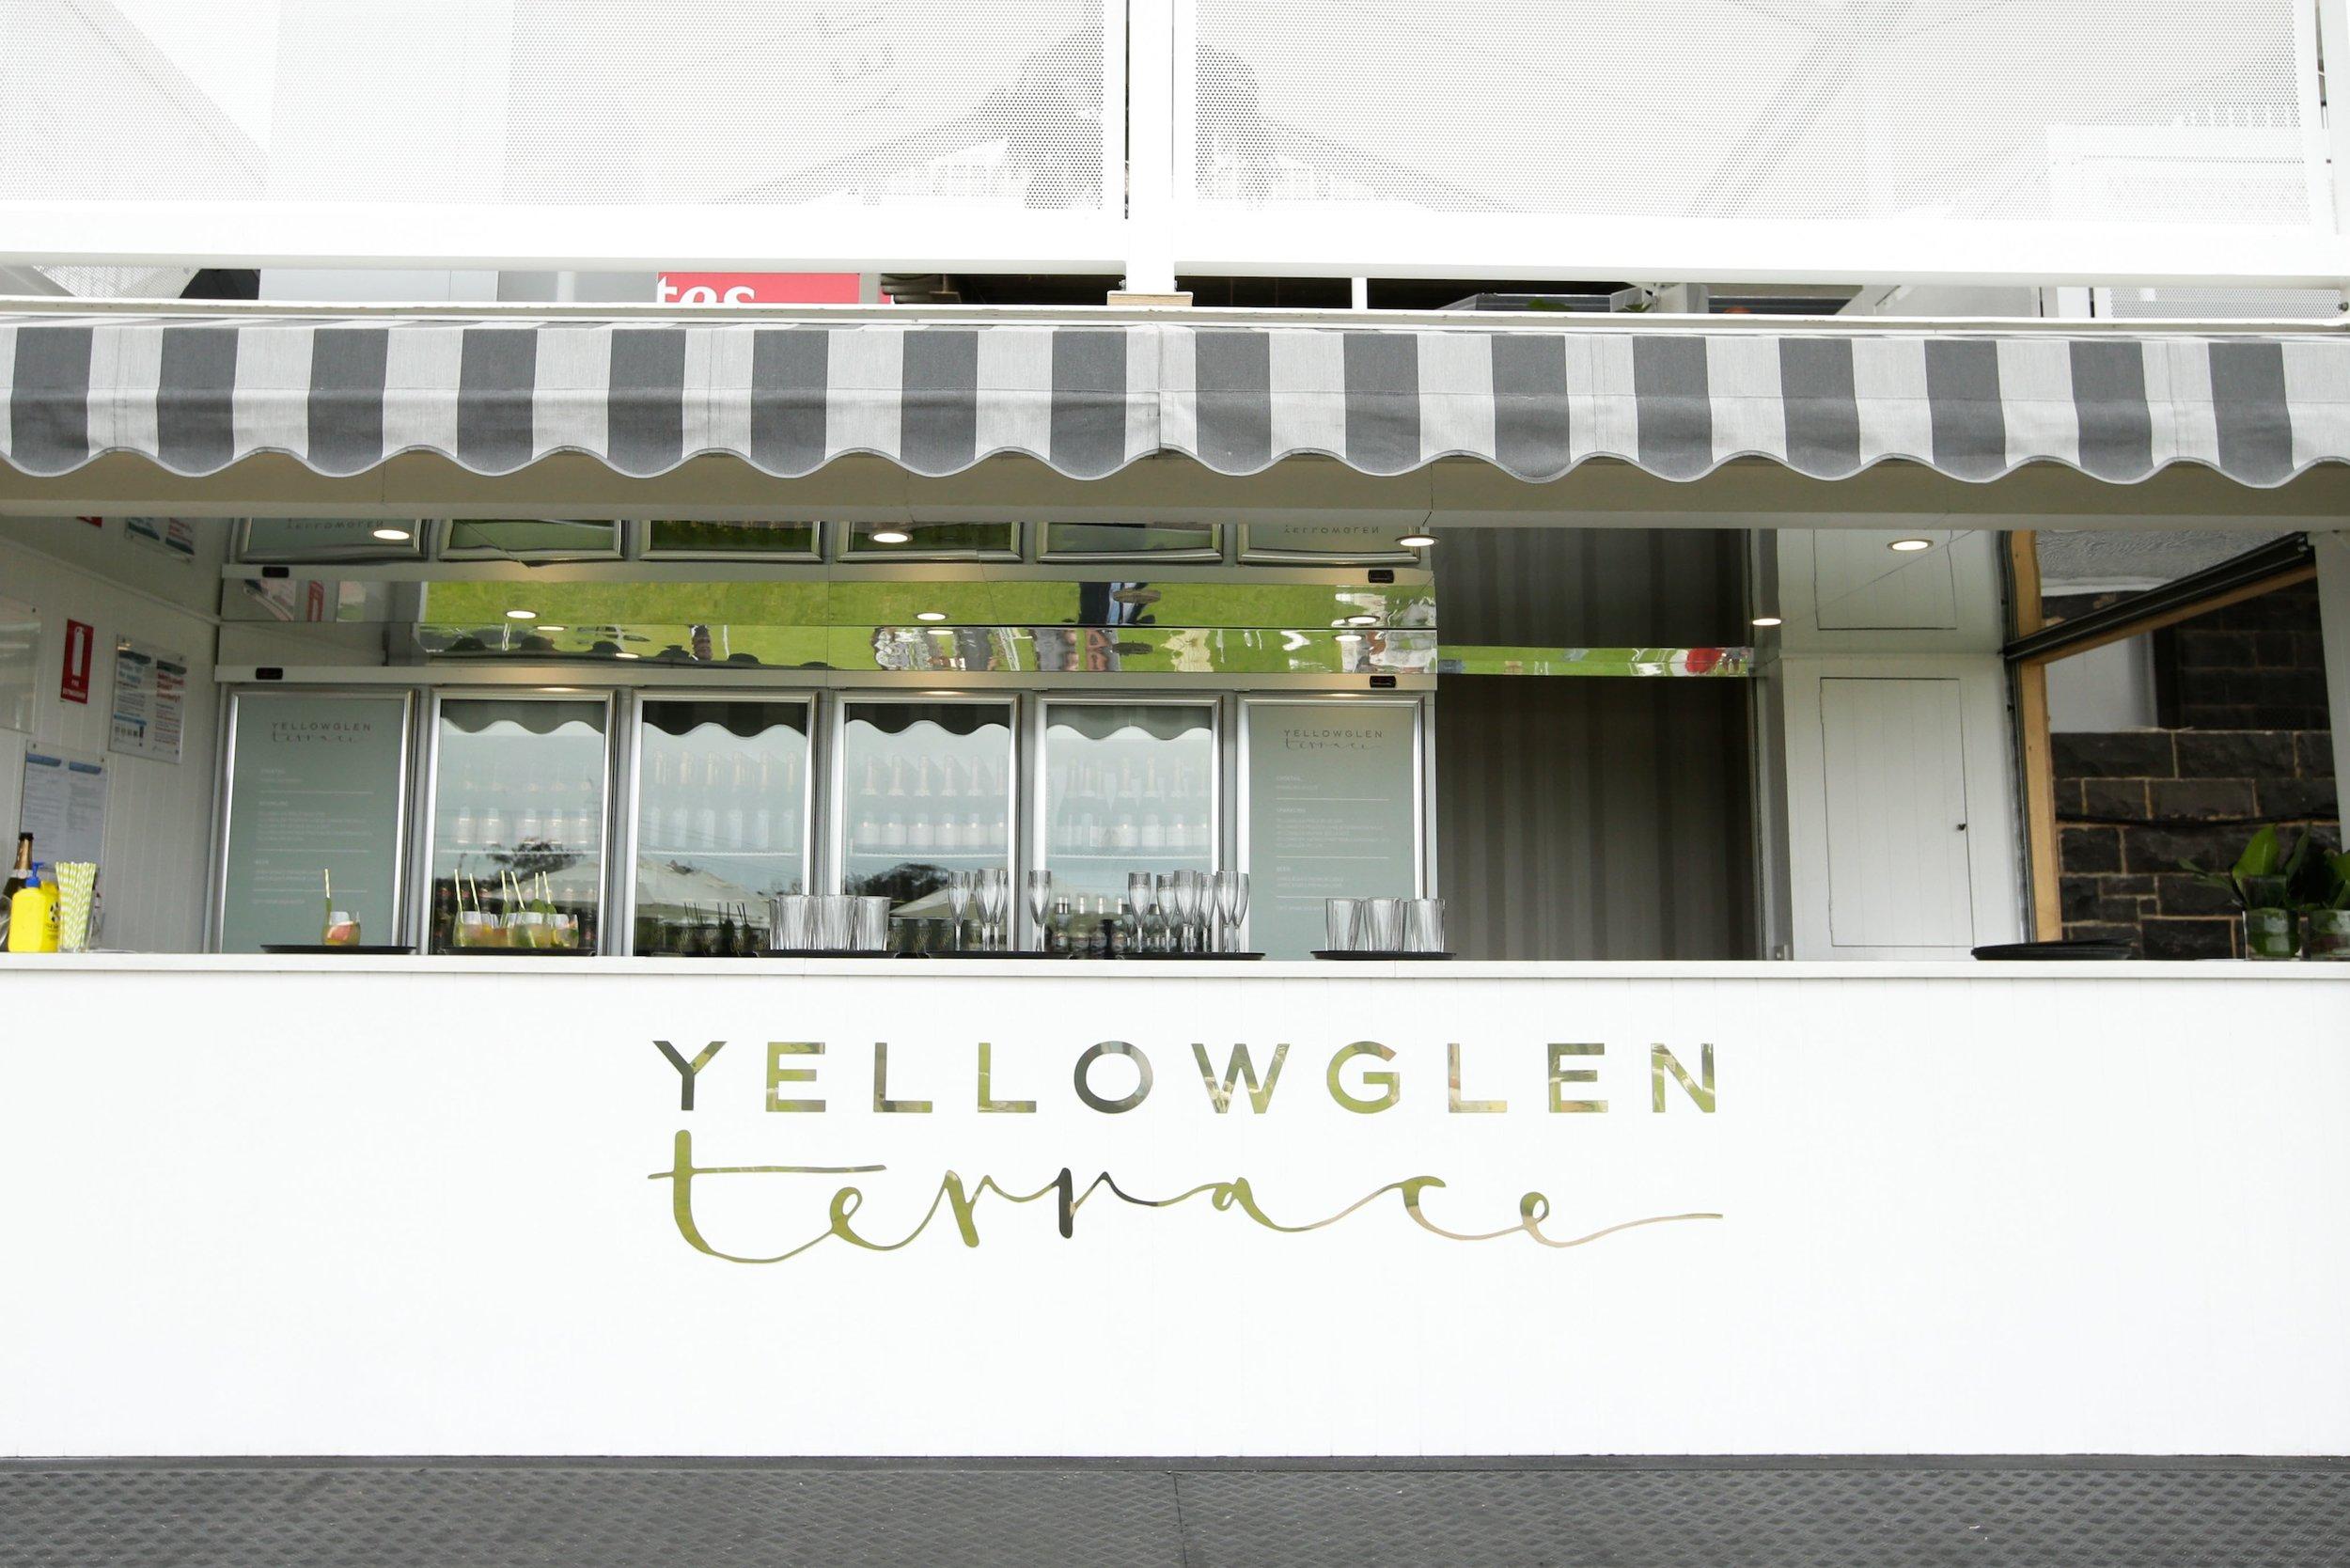 yellowglen-sofitel-girls-day-out-2.jpg